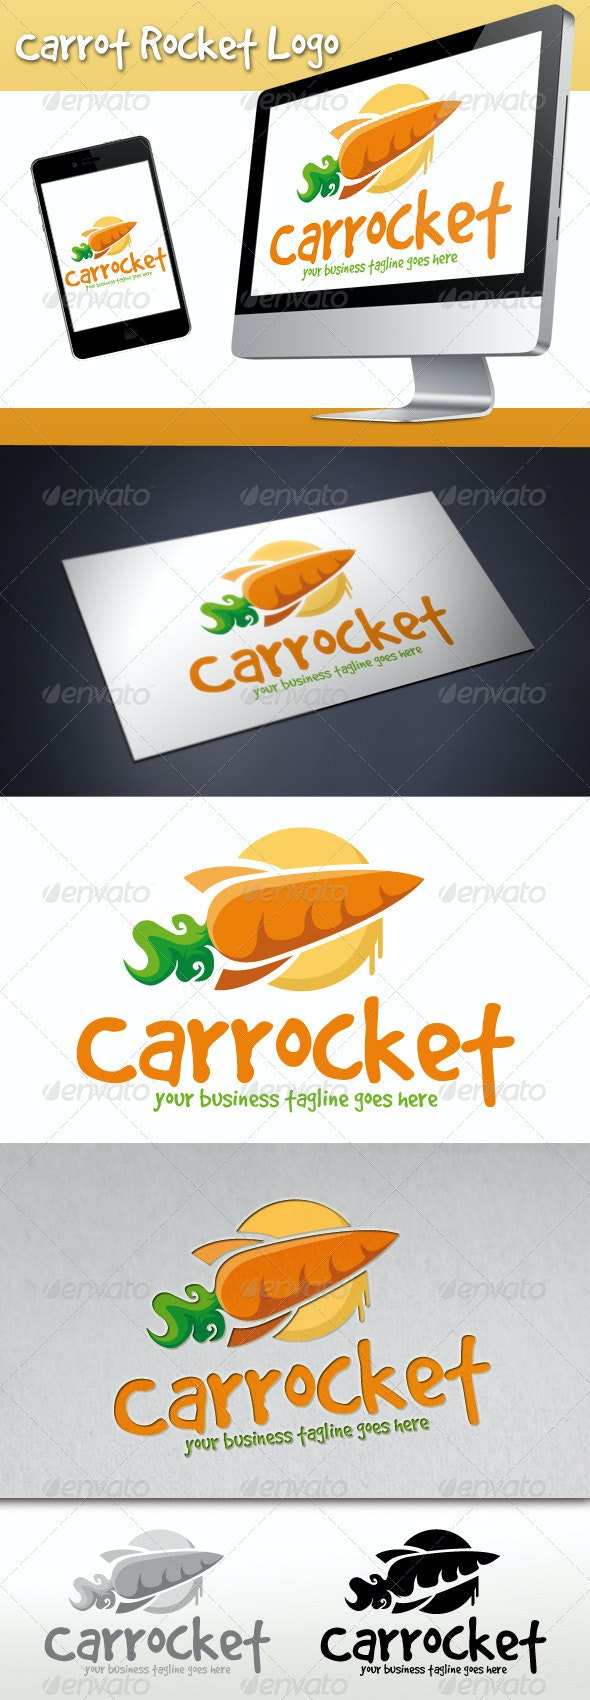 Carrot Rocket Logo (Carrocket) - Food Logo Templates